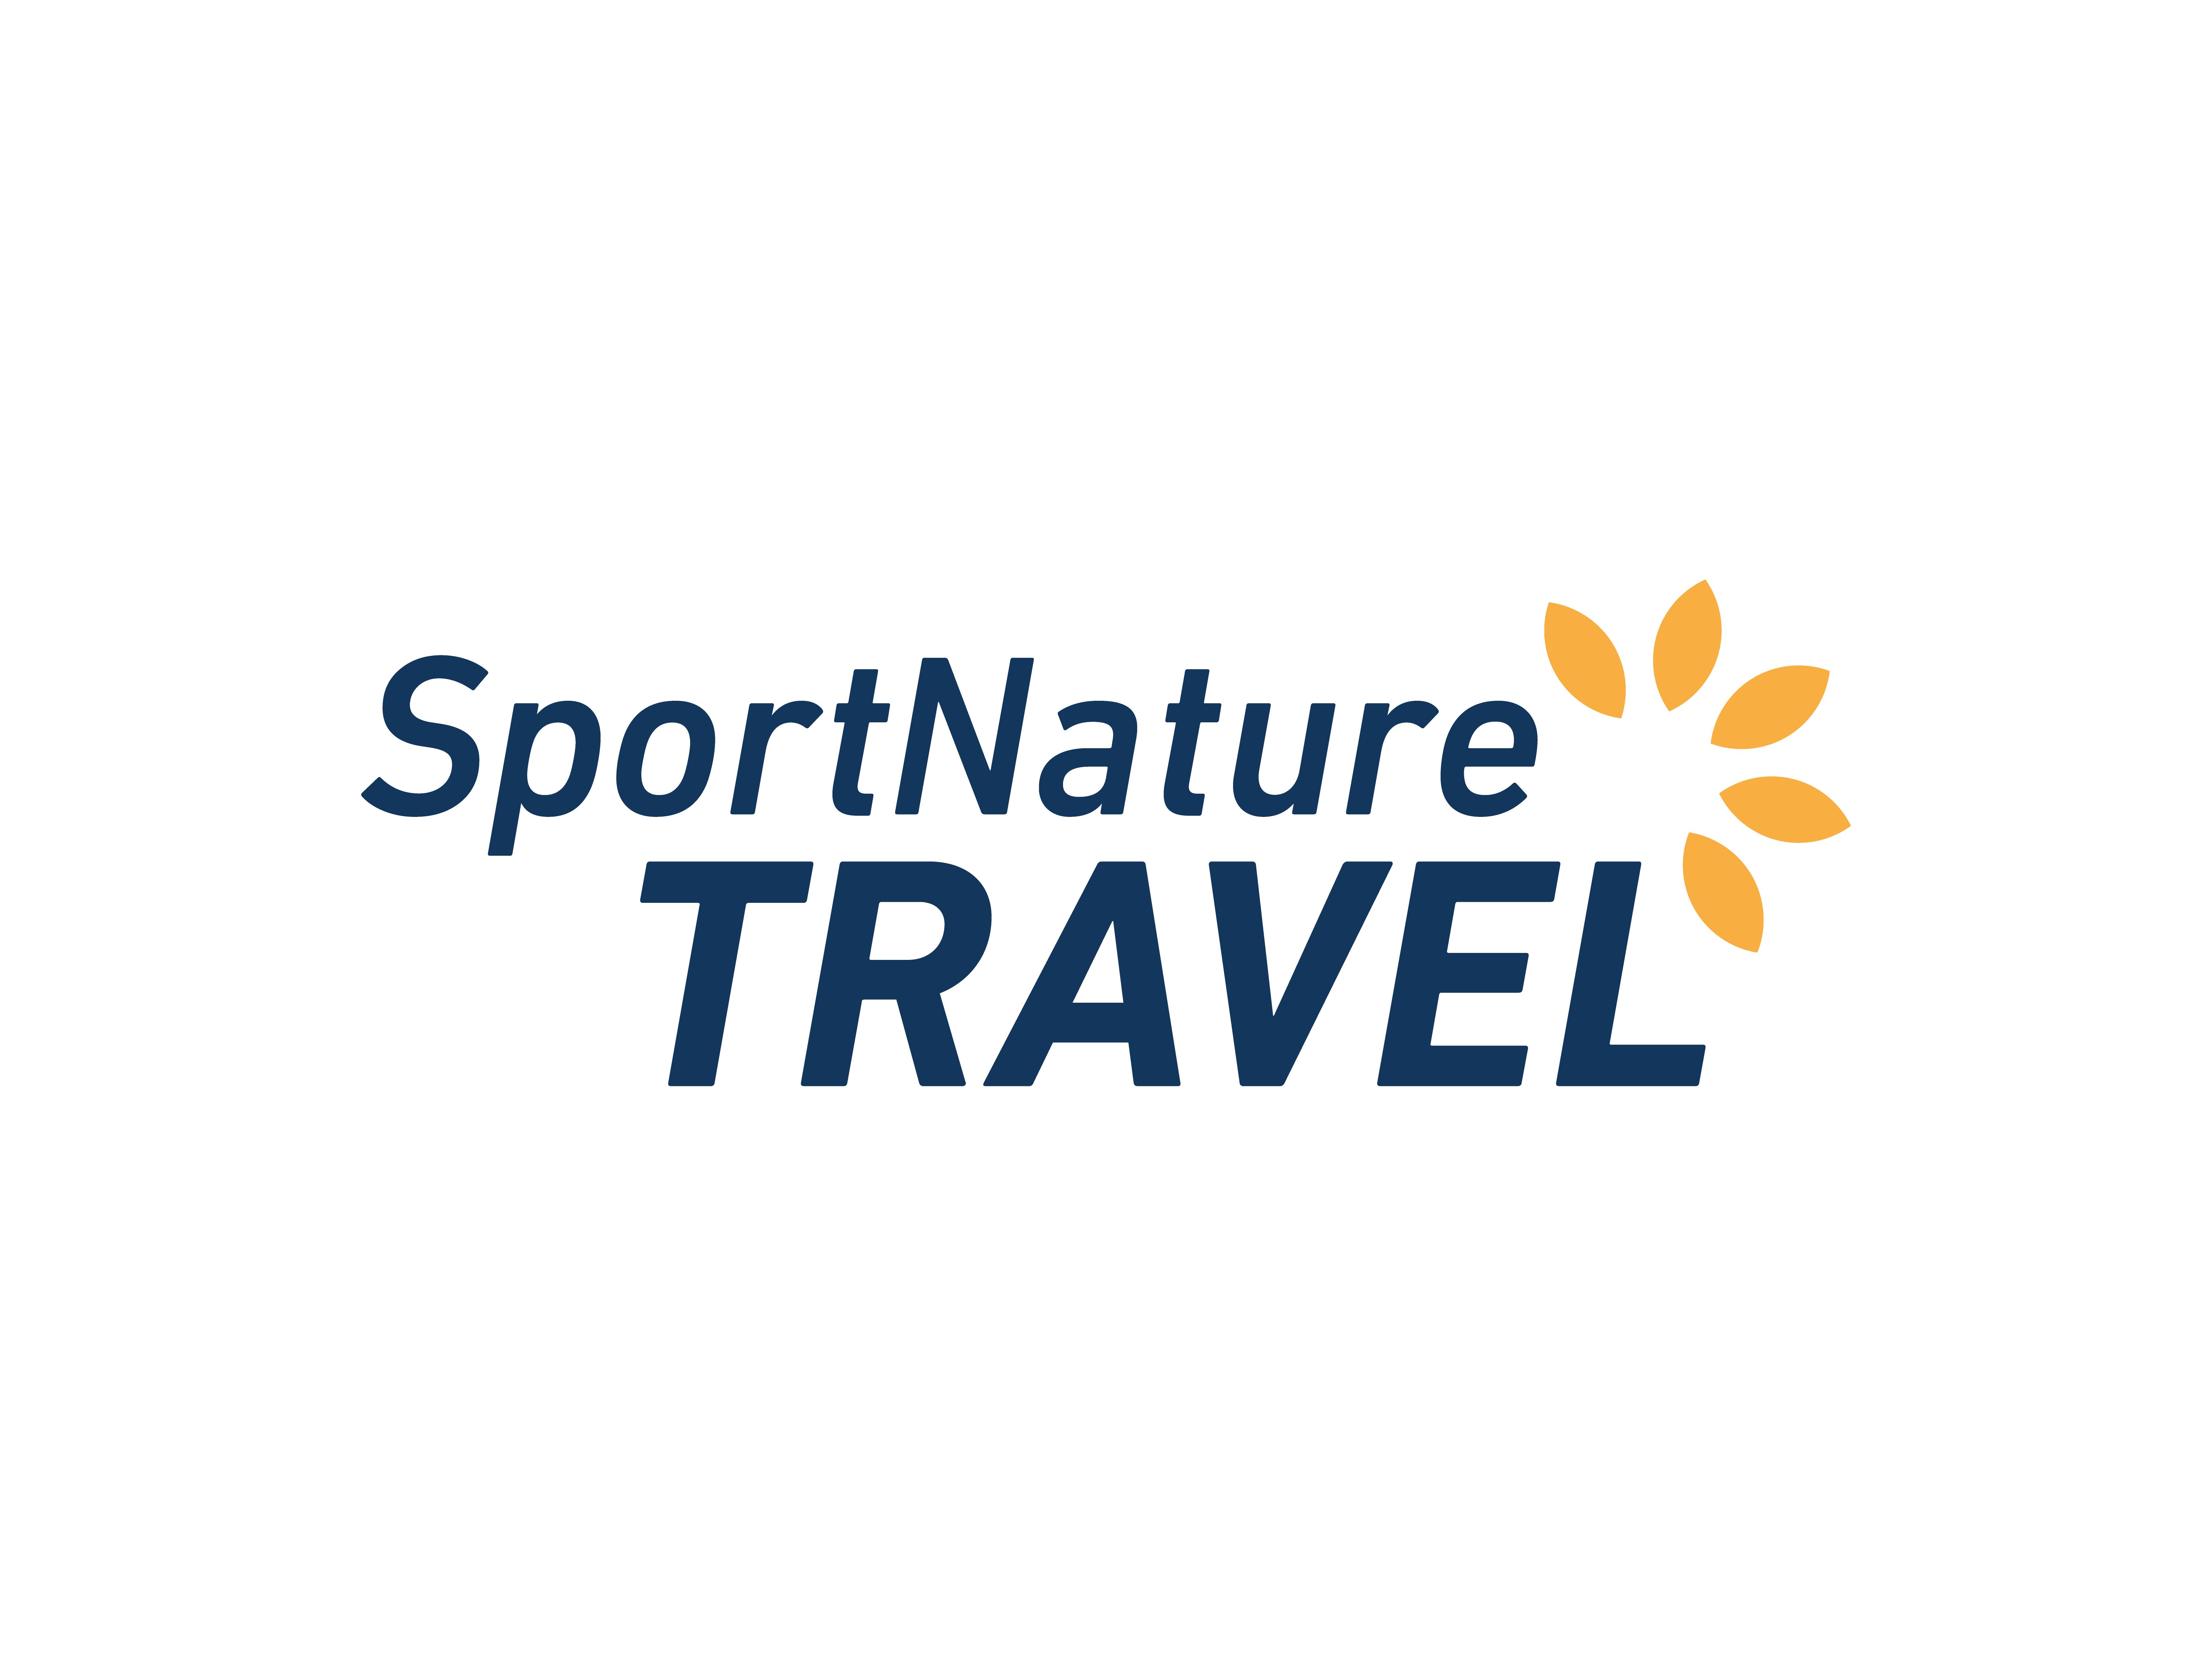 SportNature Travel